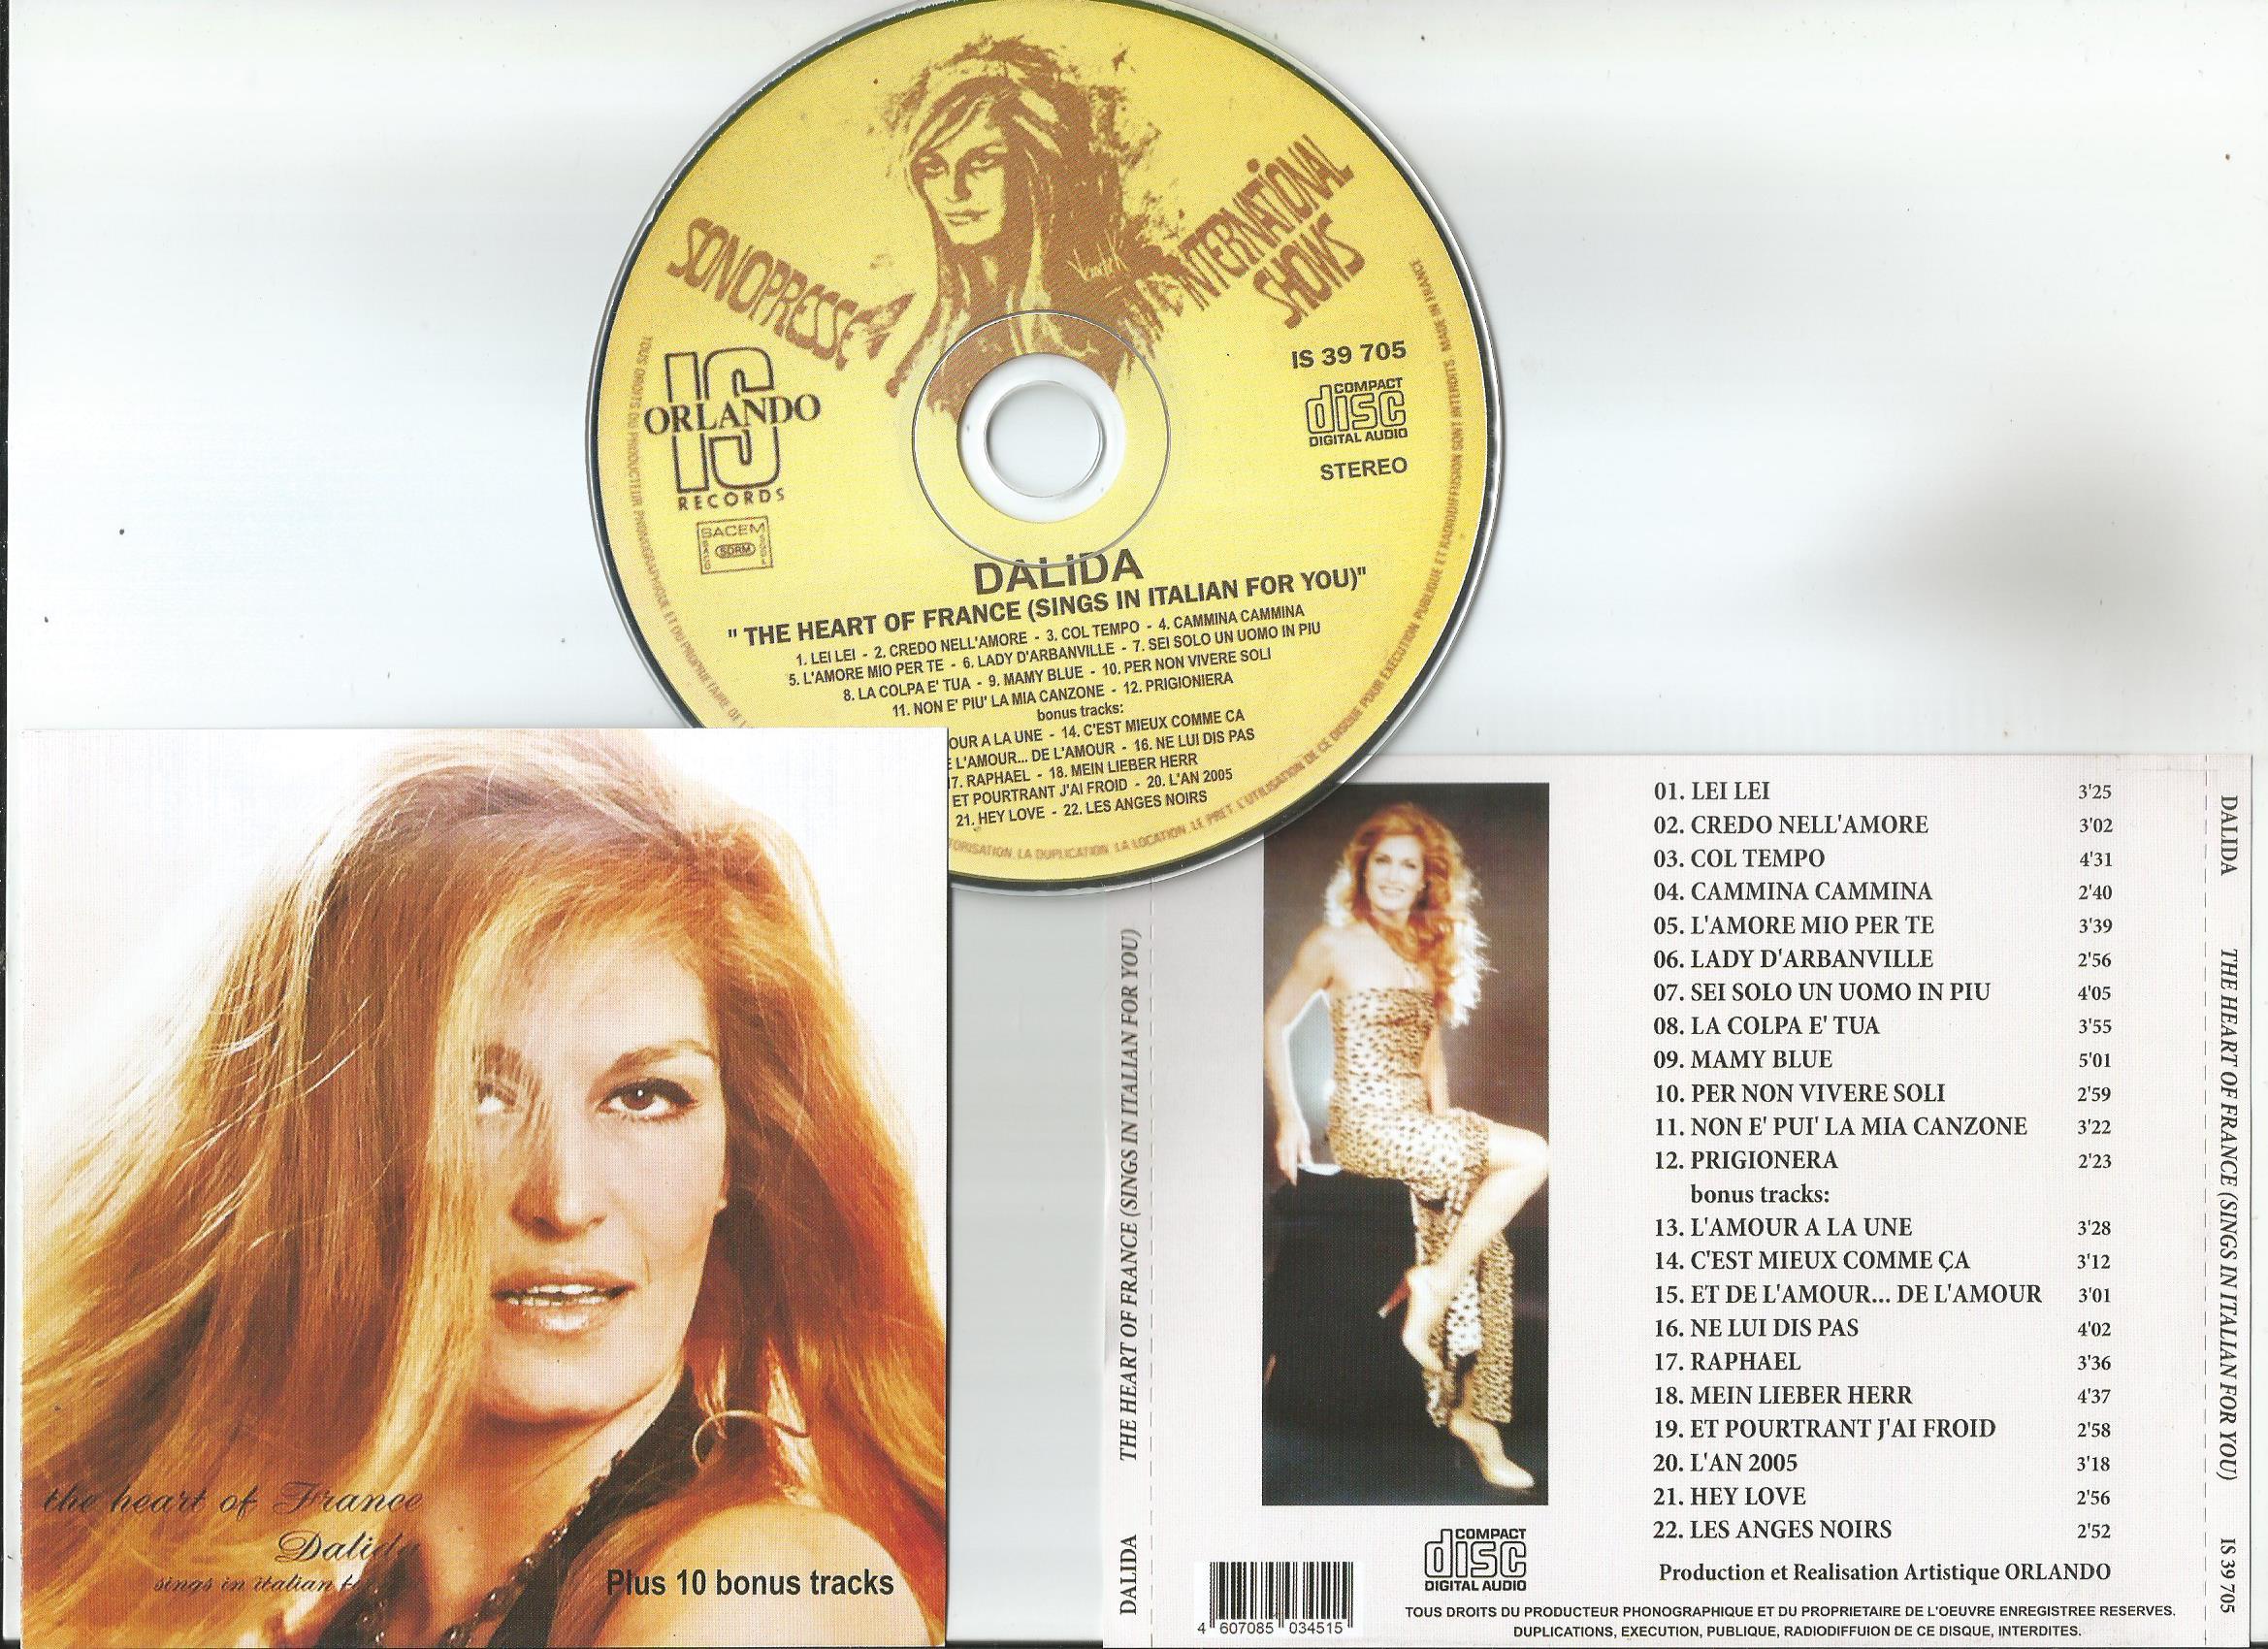 dalida the heart of france (sings in italian for you) + 10bonus tracks